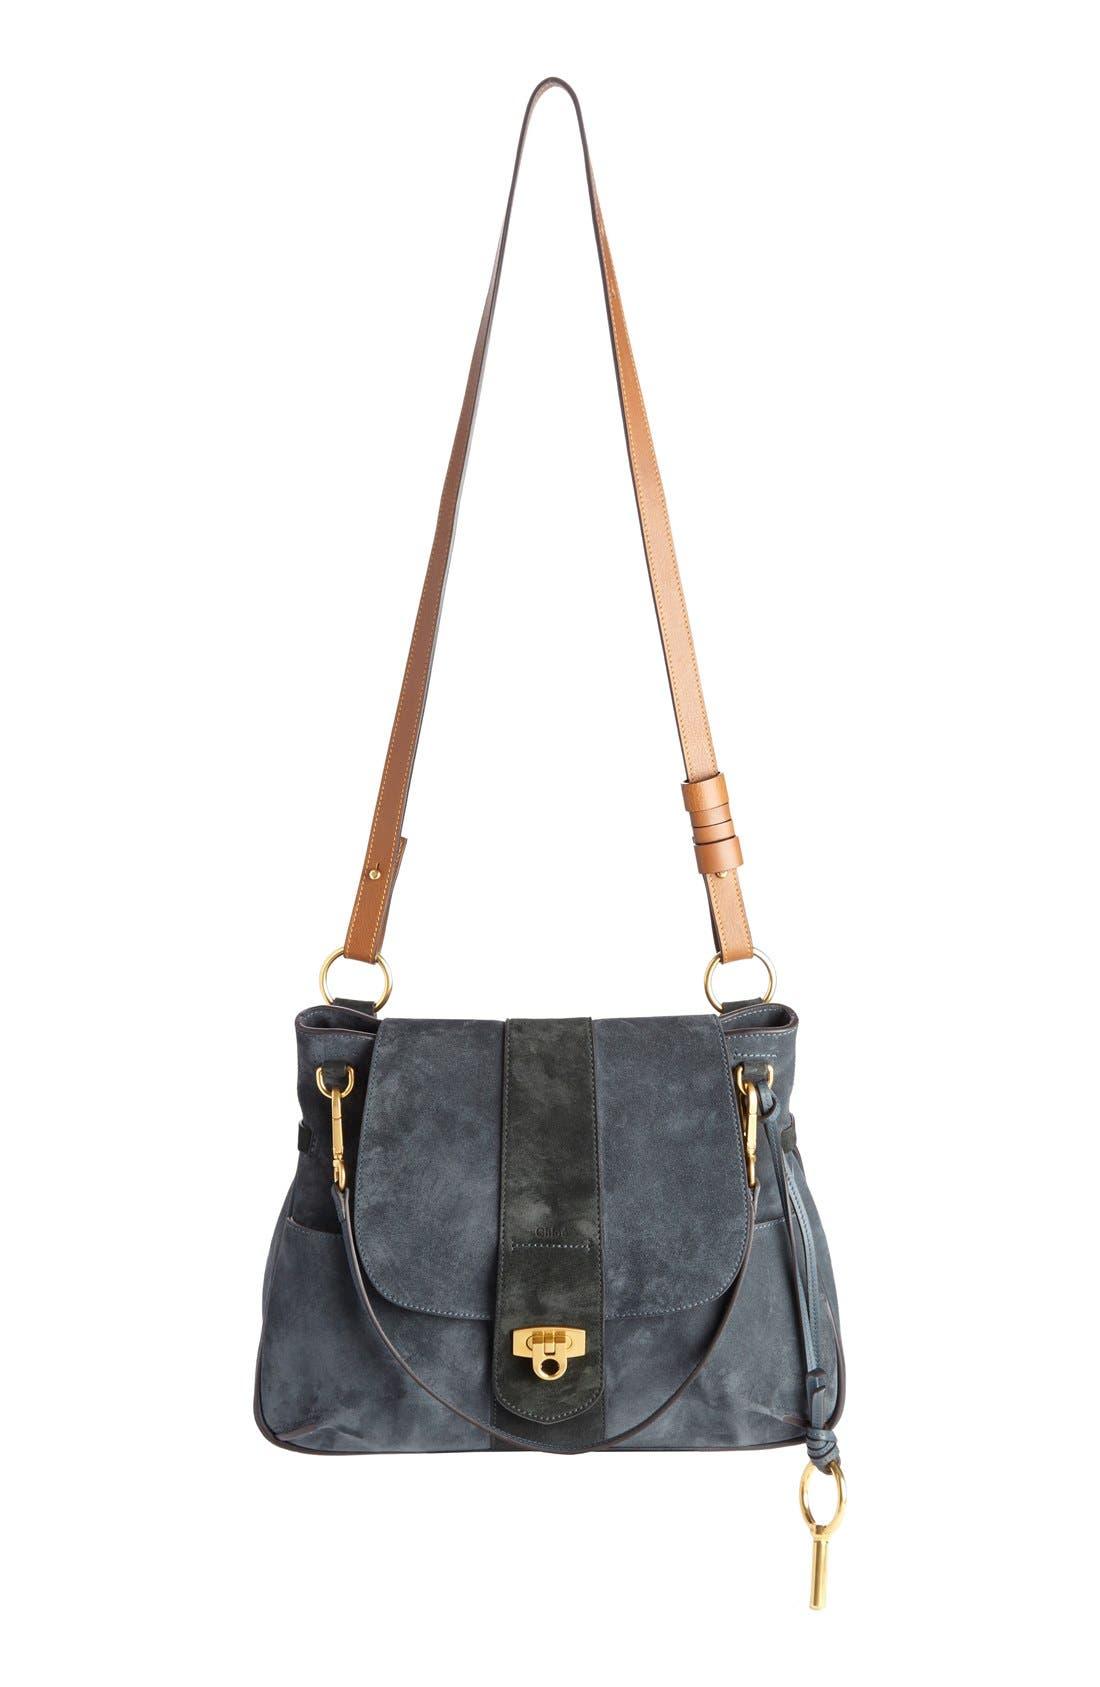 Alternate Image 1 Selected - Chloé 'Medium Lexa' Suede Shoulder Bag